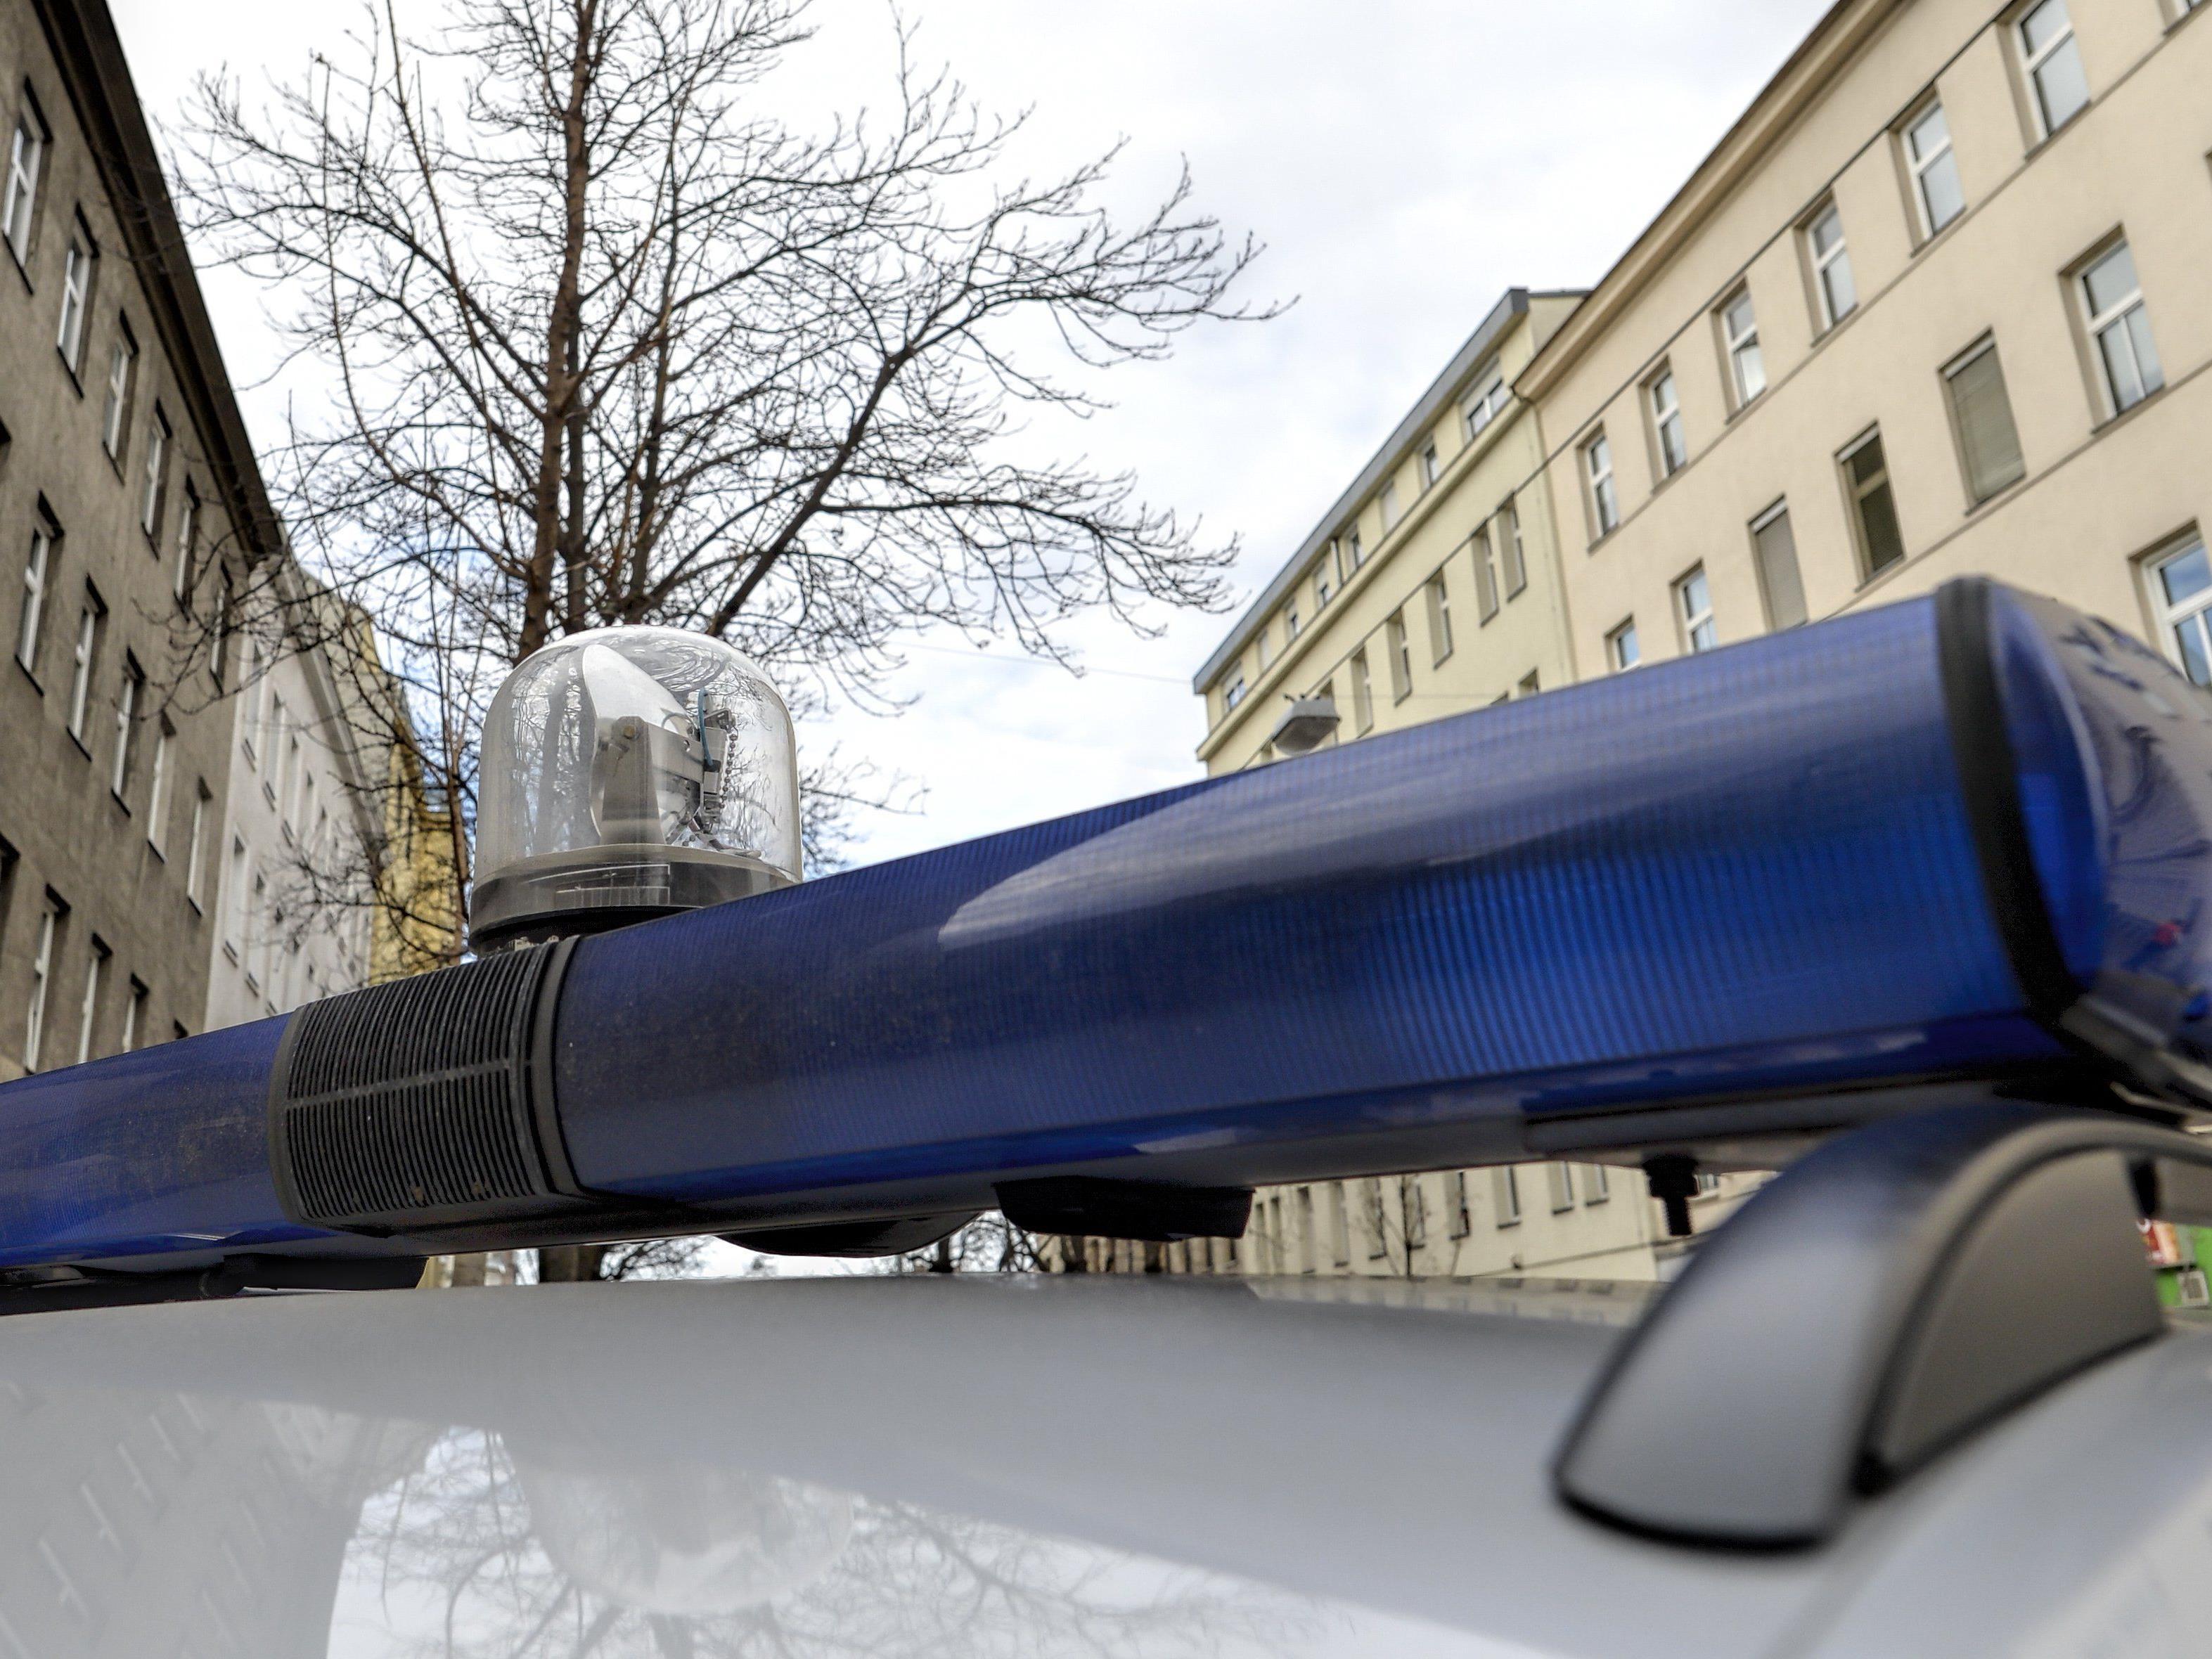 Mutmaßlicher Drogendealer in Wien-Floridsdorf verhaftet.